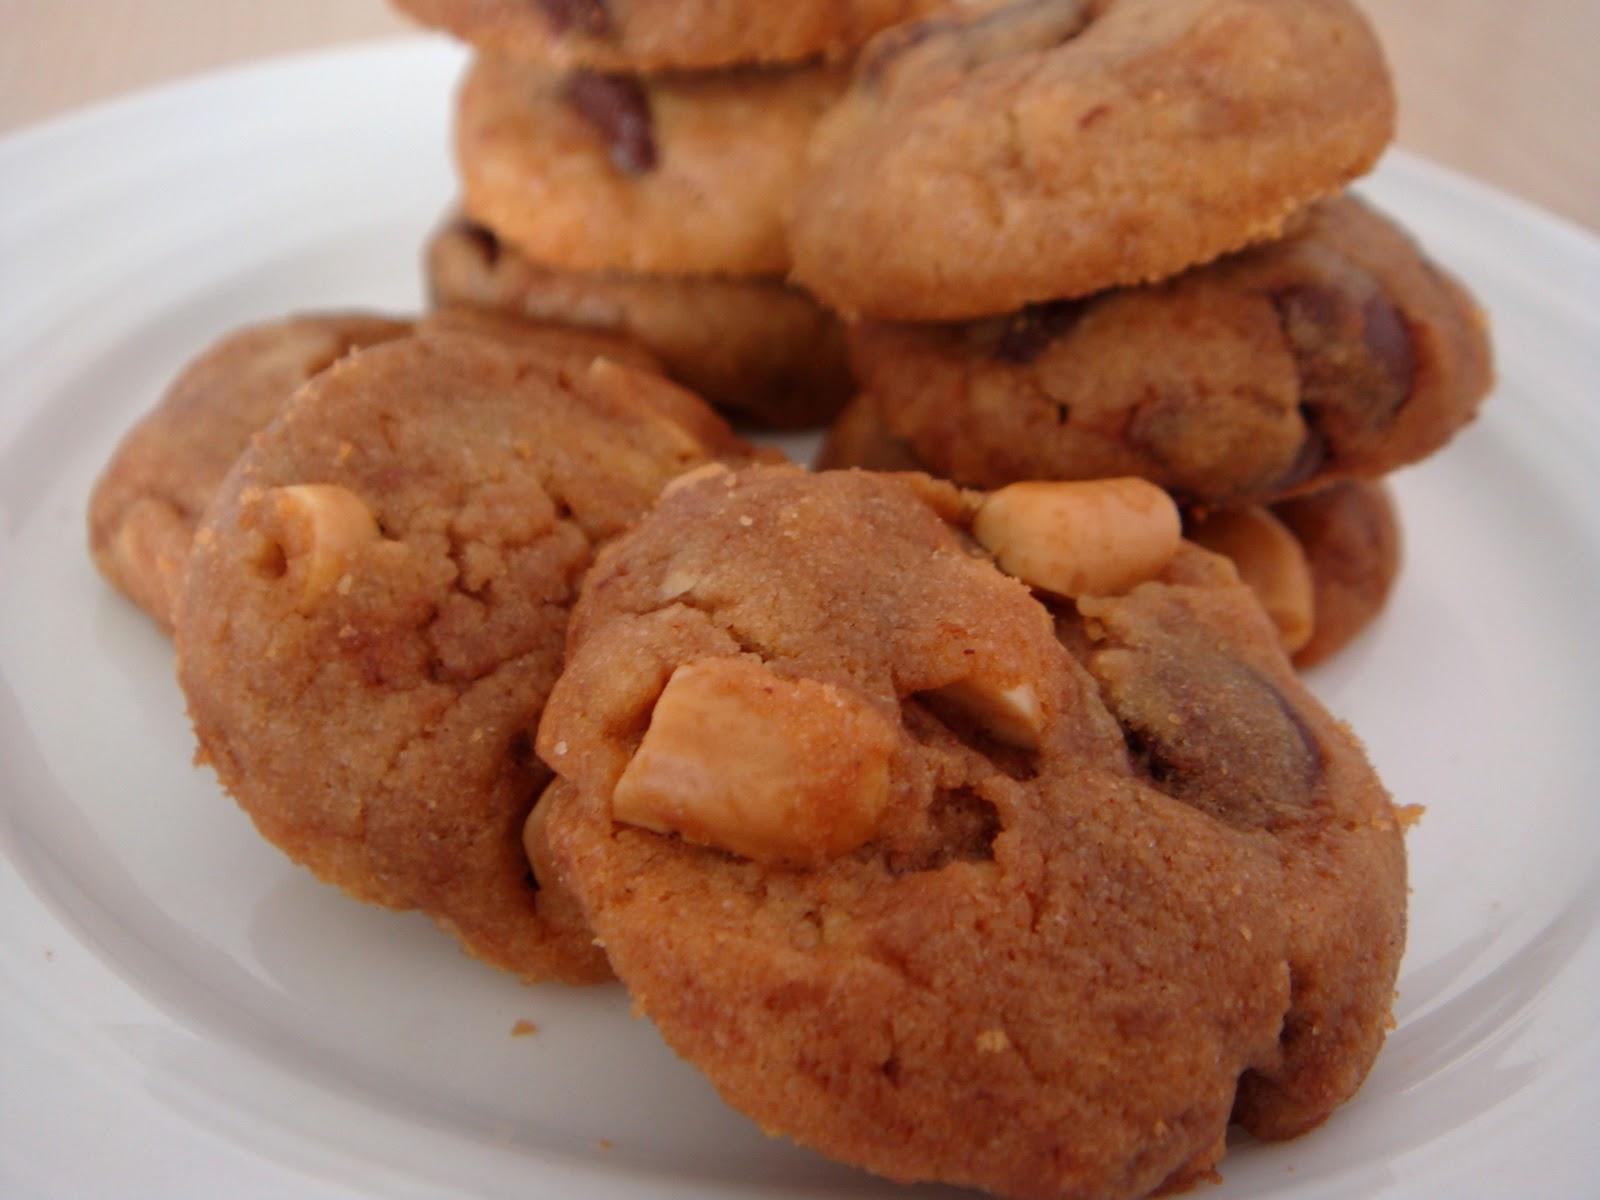 ... Christmas Goodies - Chunky Peanut, Chocolate Chip and Cinnamon Cookies